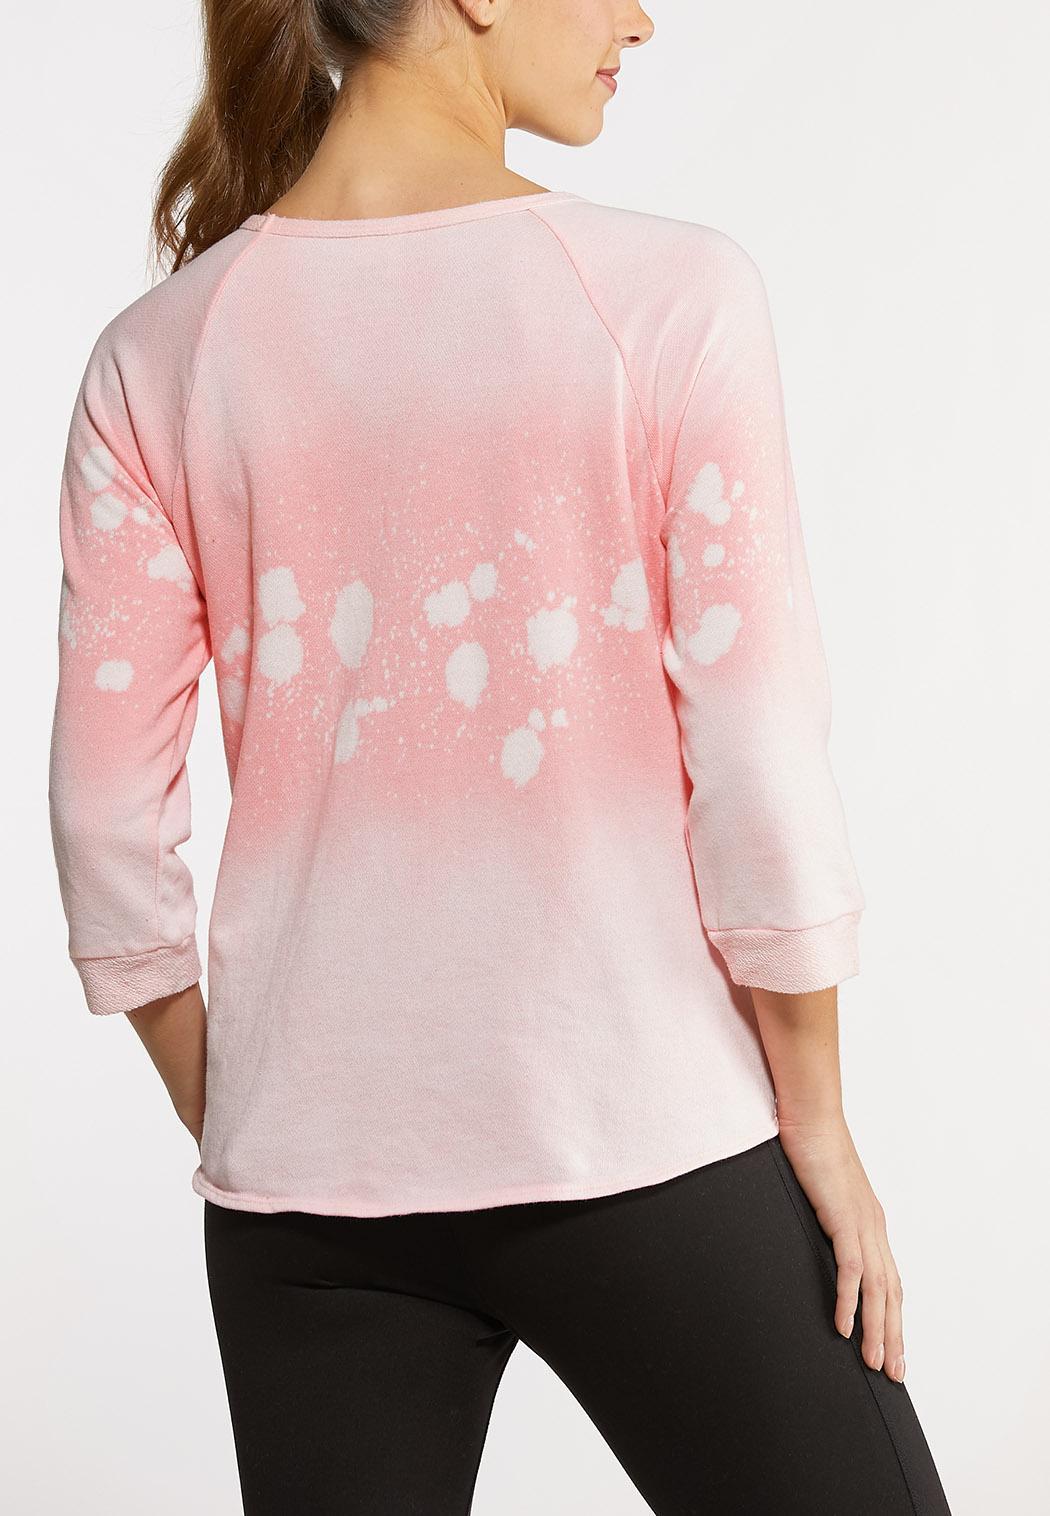 Plus Size Pink Tie Dye Top (Item #44144597)